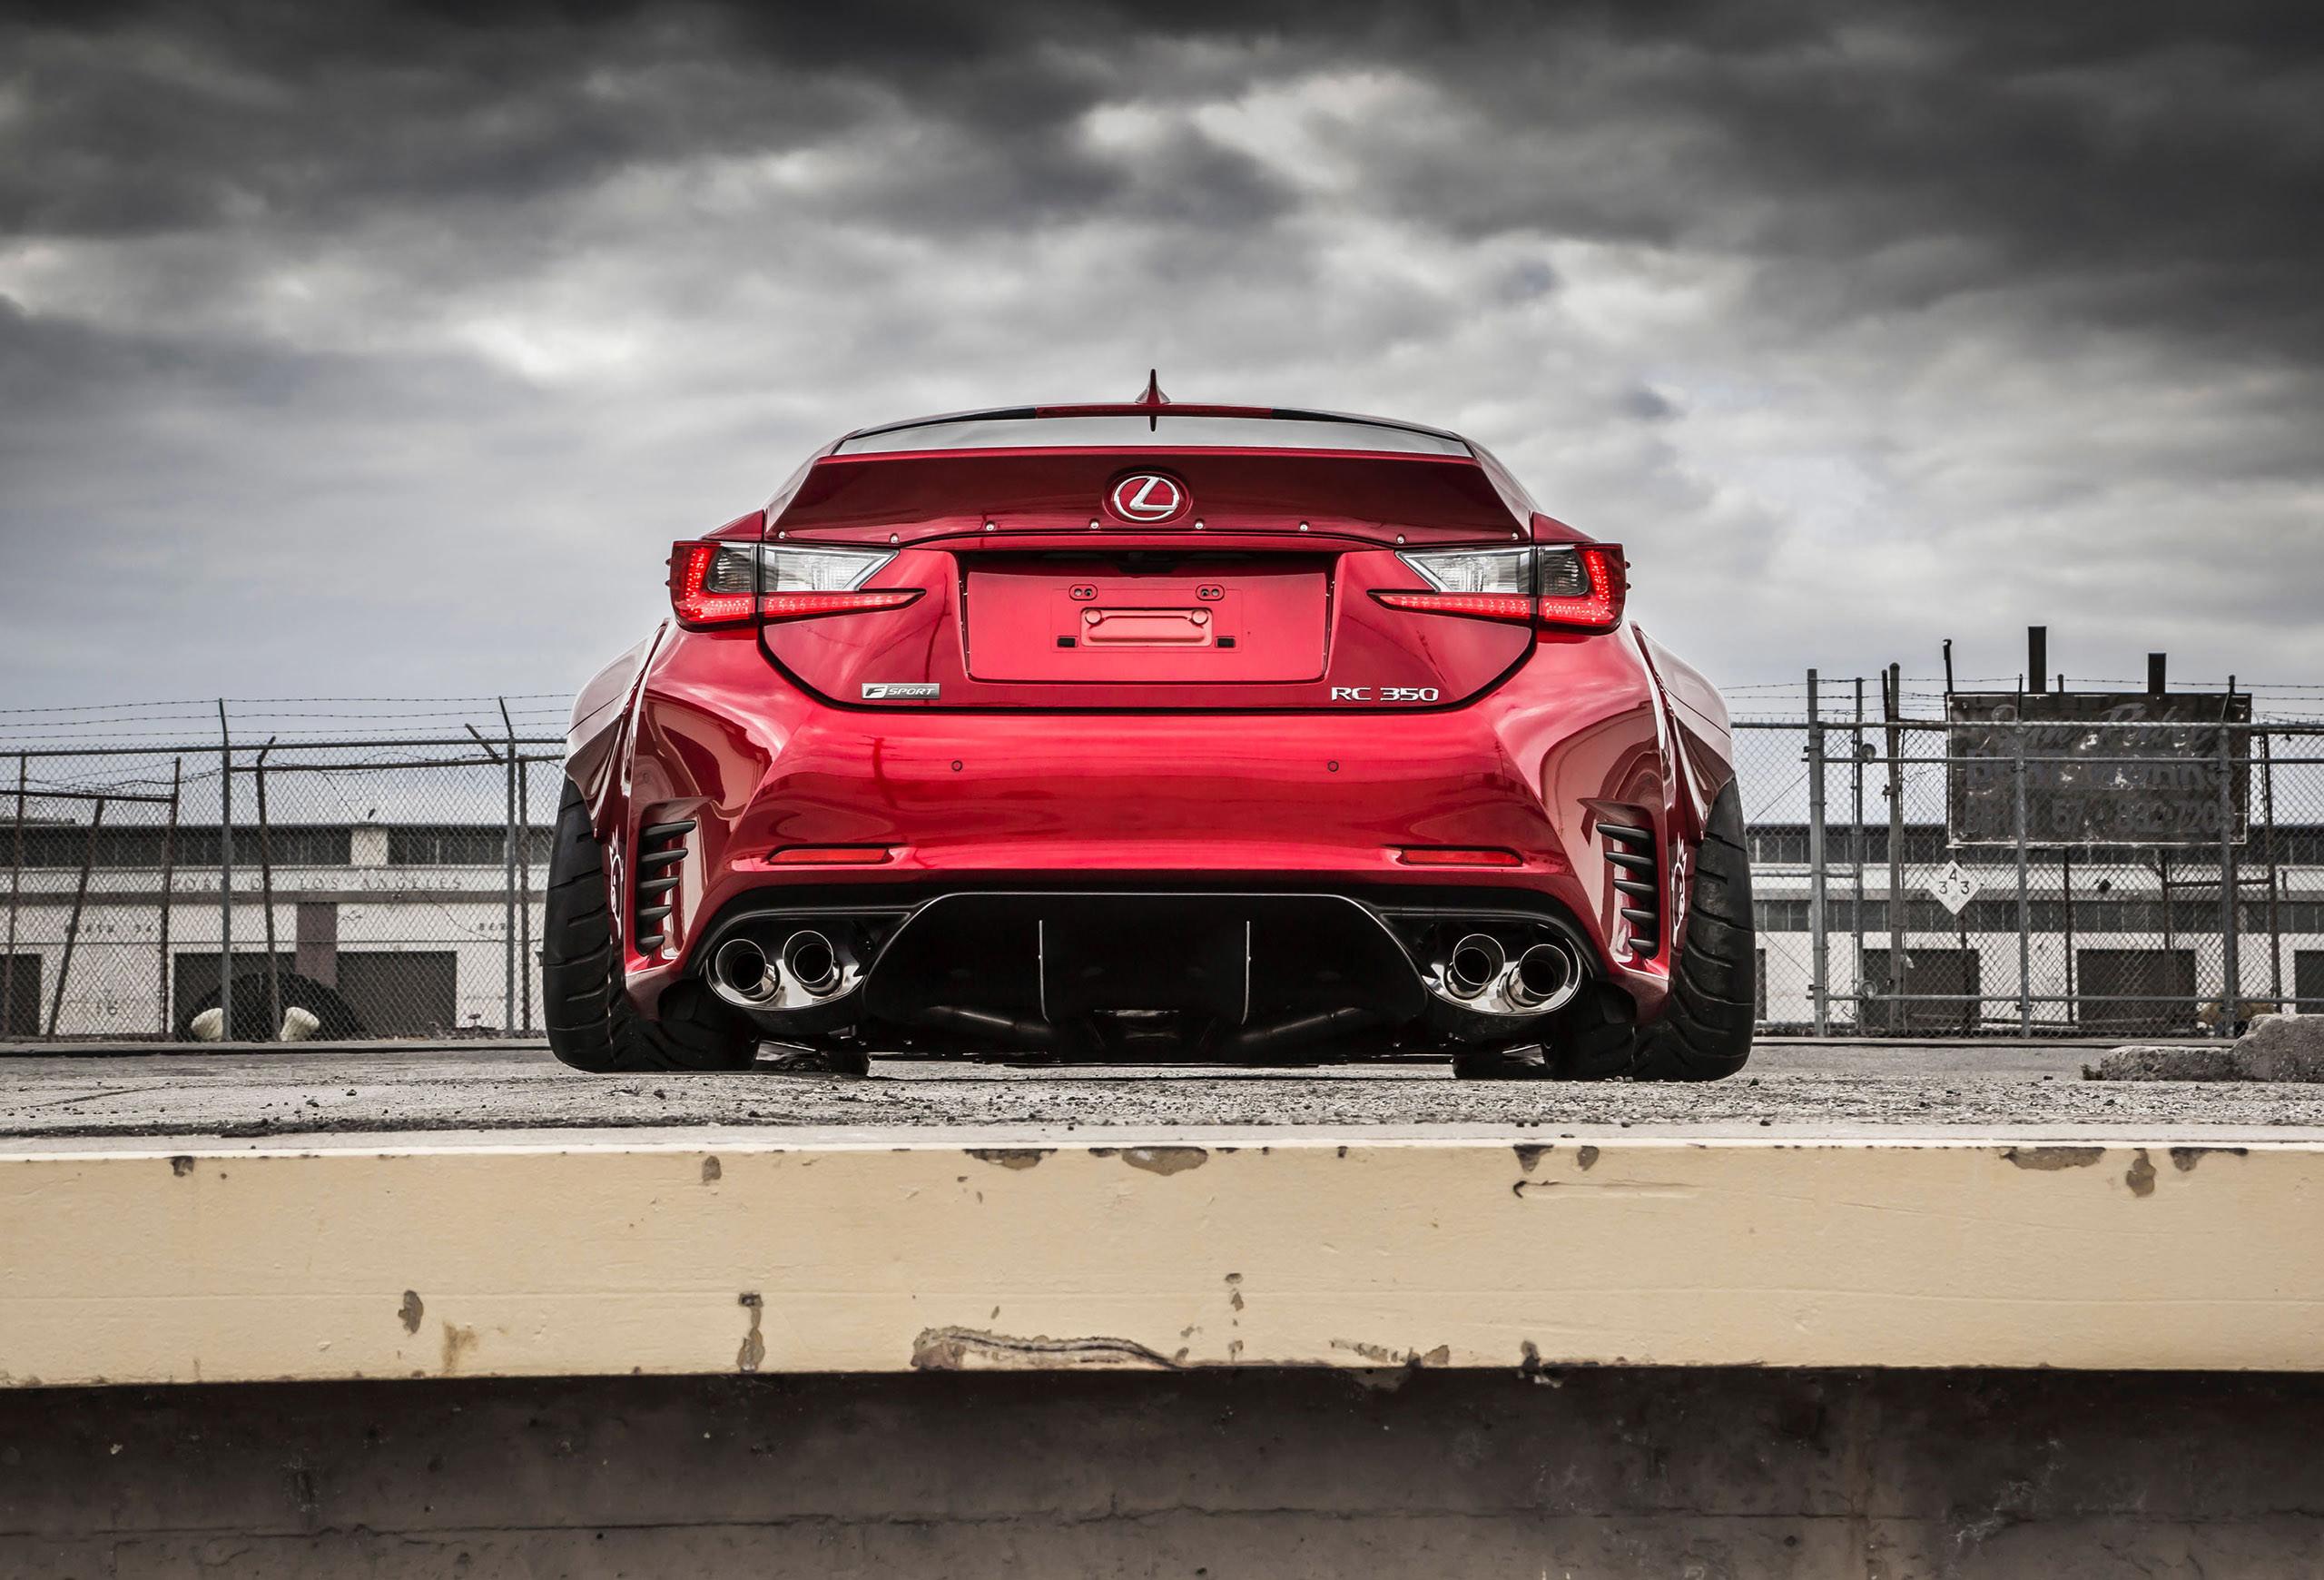 Res: 2560x1740, Rocket Bunny Lexus RC F SPORT